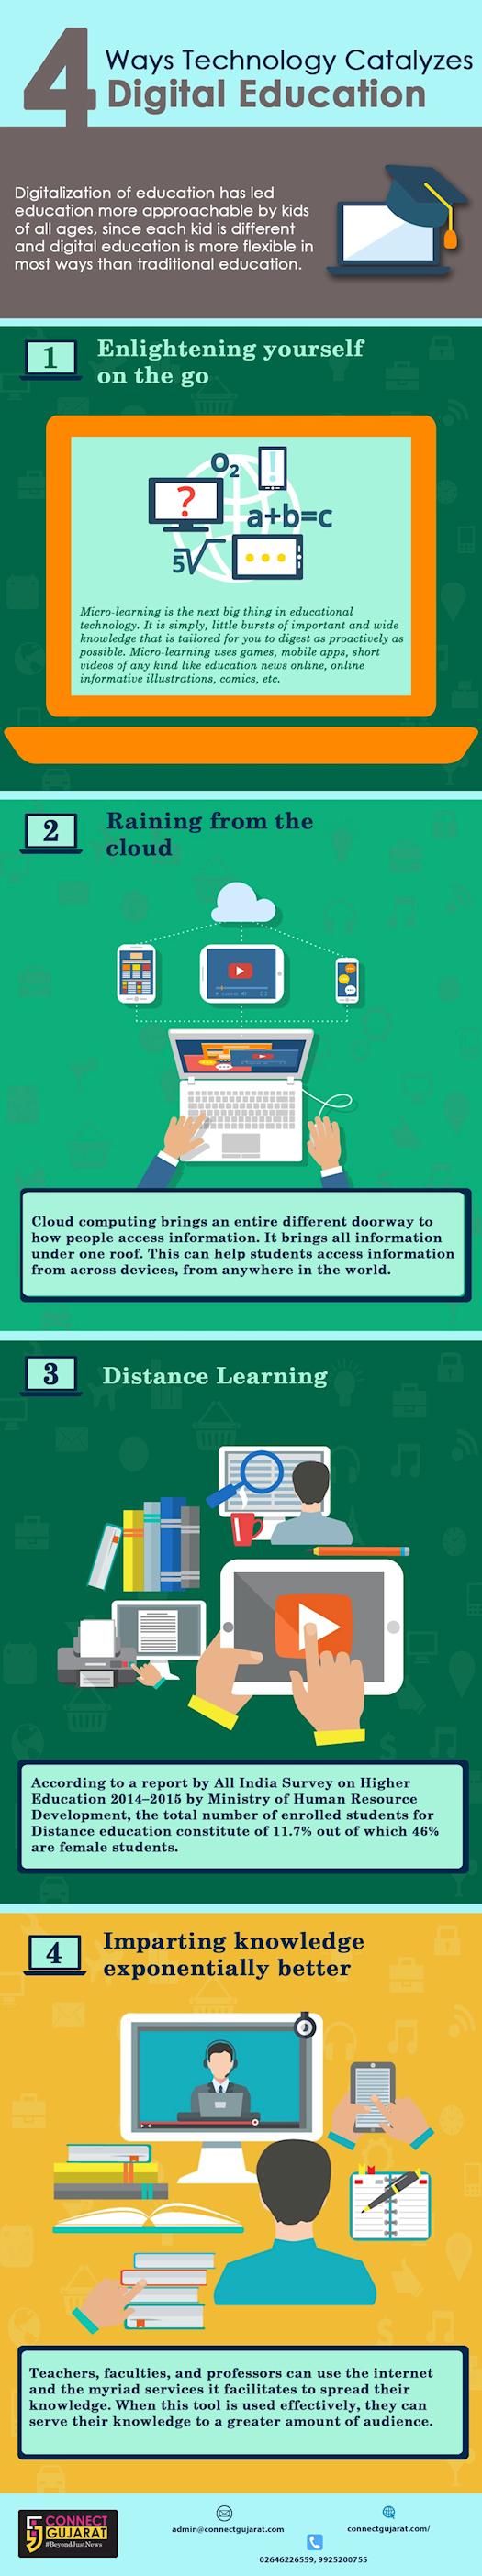 4 Ways Technology Catalyzes Digital Education